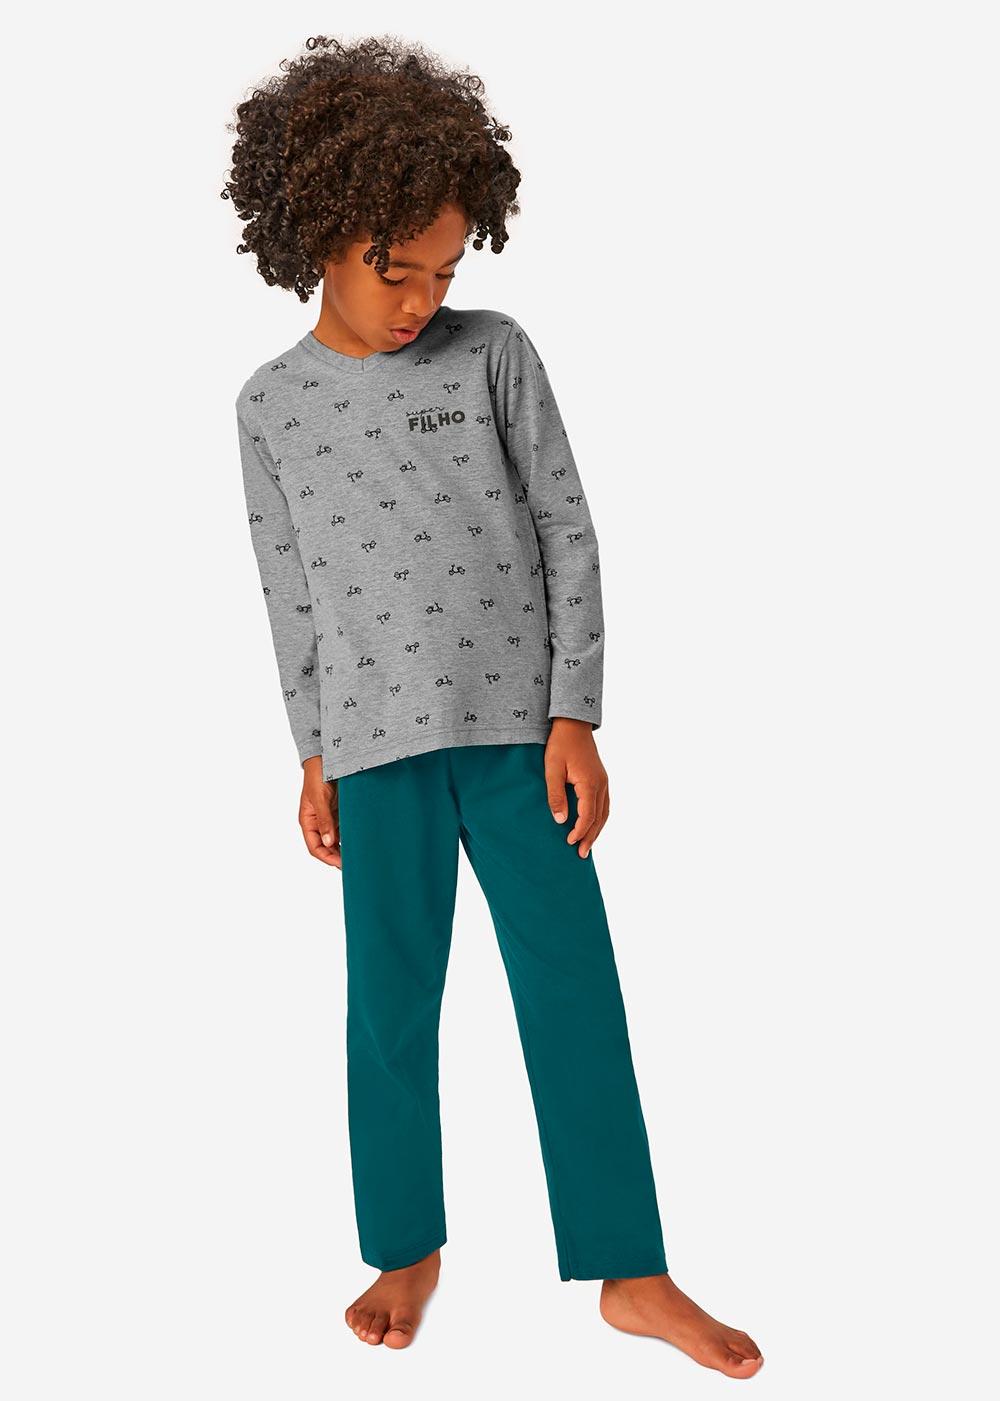 Pijama Infantil Masculino Inverno Cinza Super Filho - Malwee